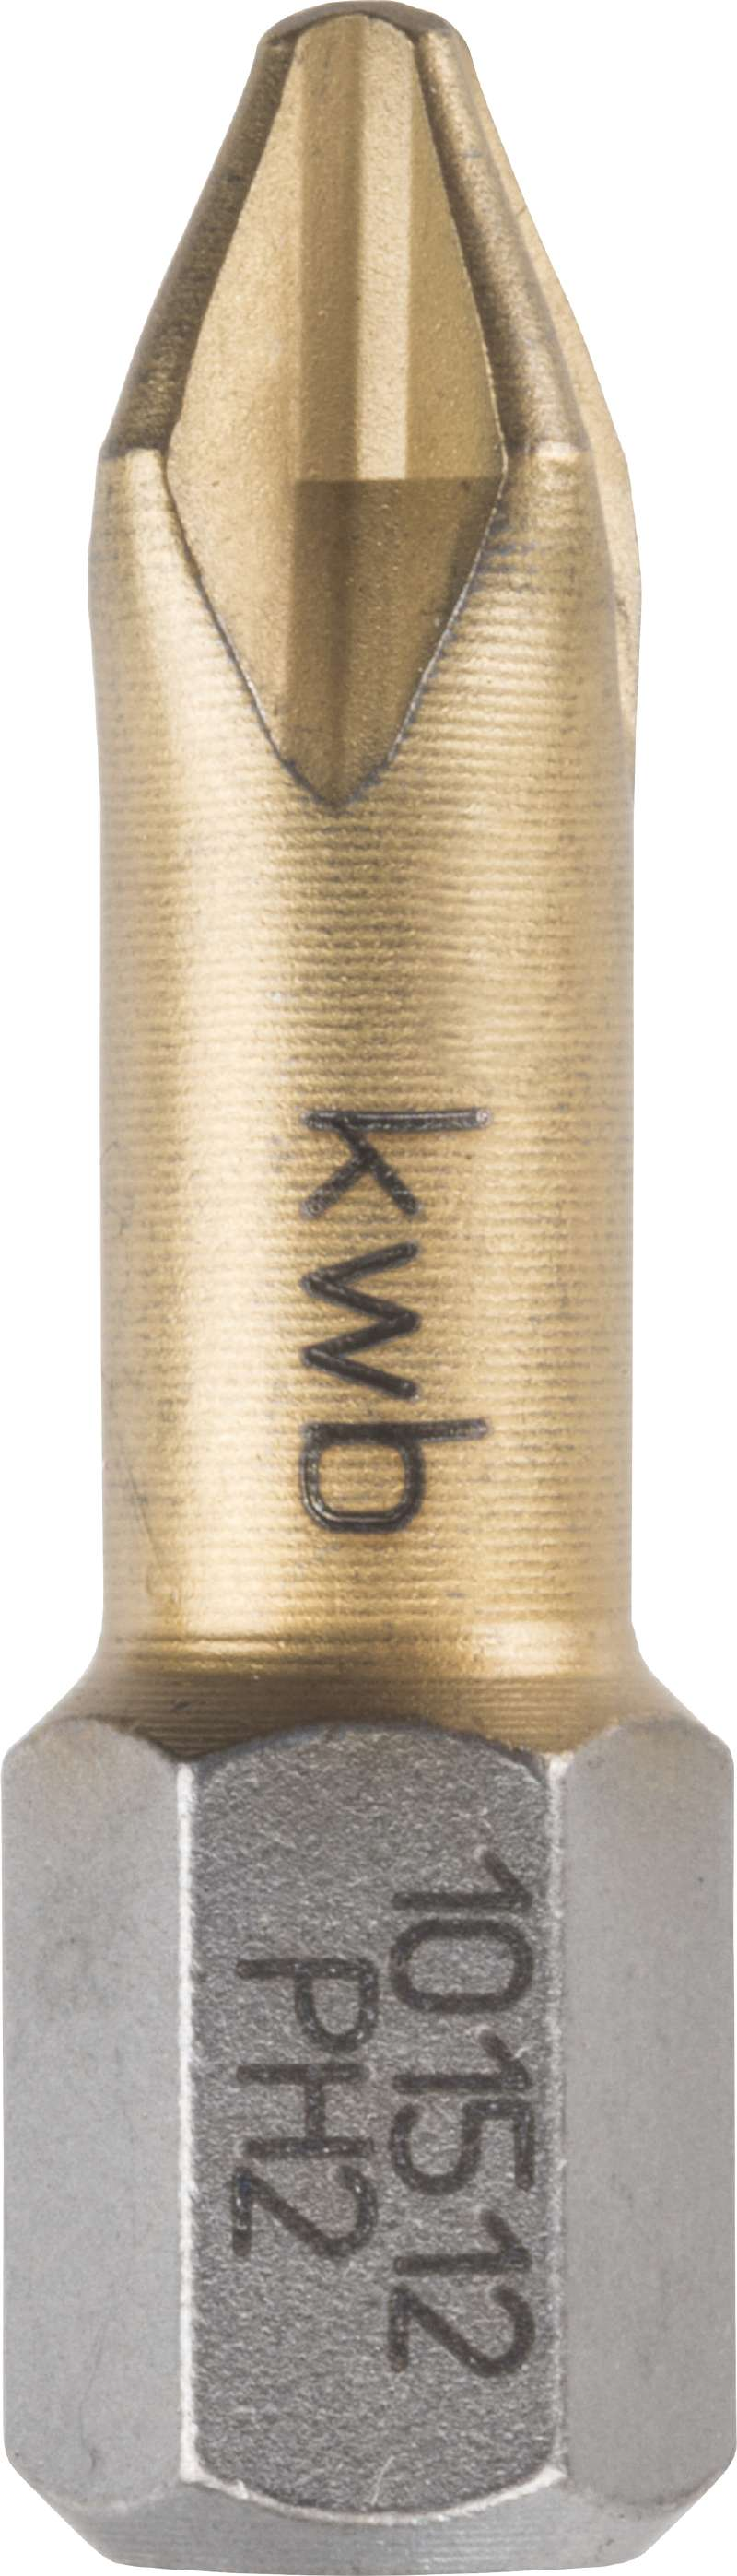 Бита Kwb 1015-03 бита kwb 1018 07